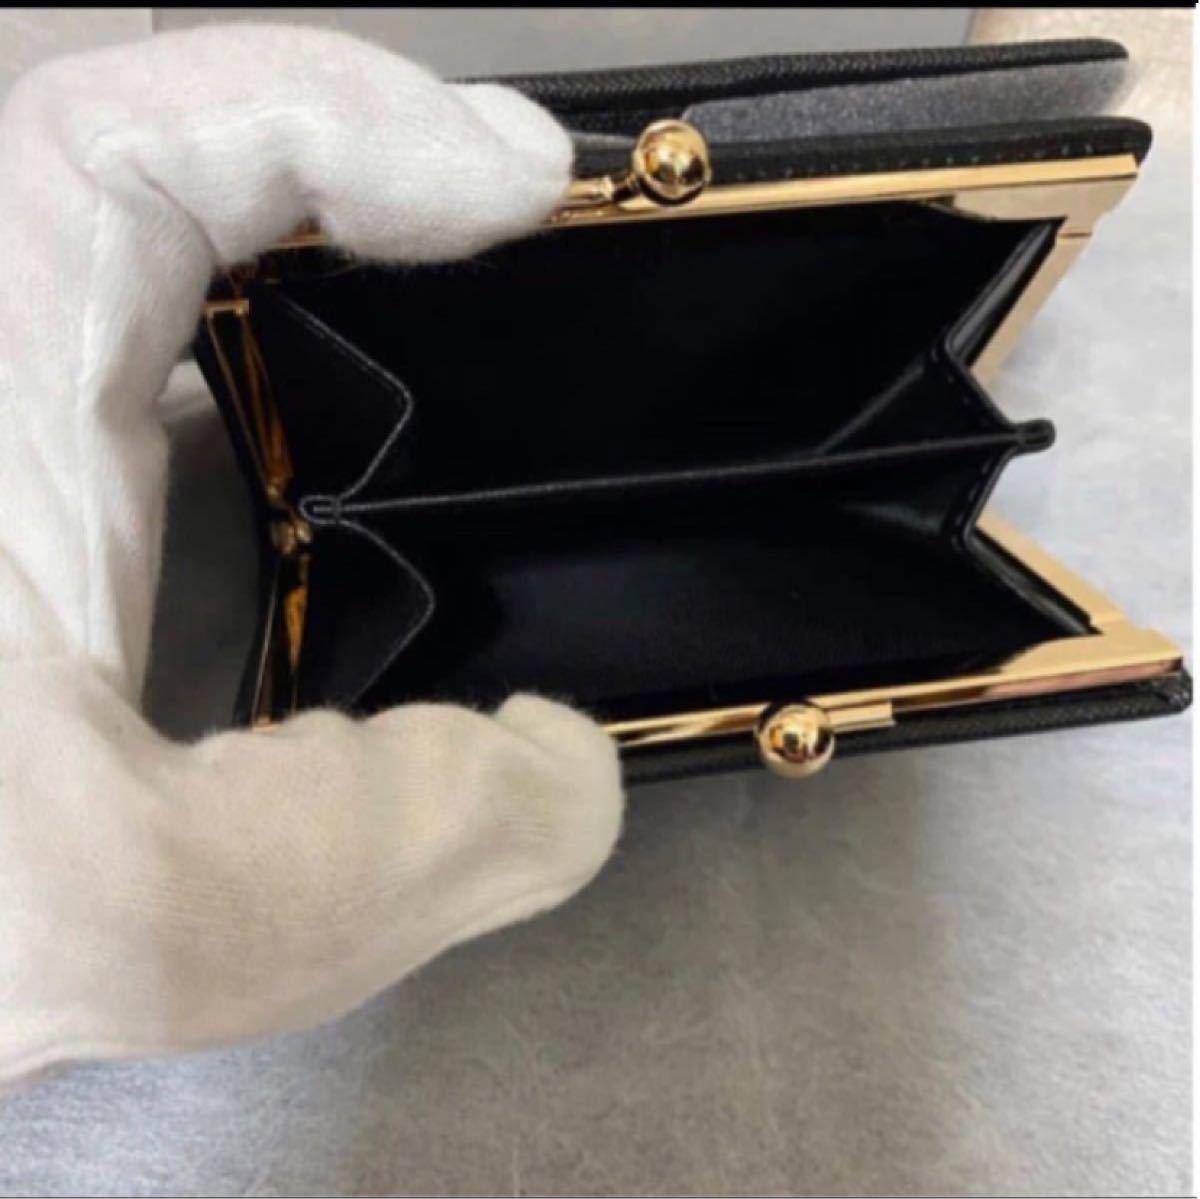 Vivienne Westwood財布 ヴィヴィアンウエストウッド